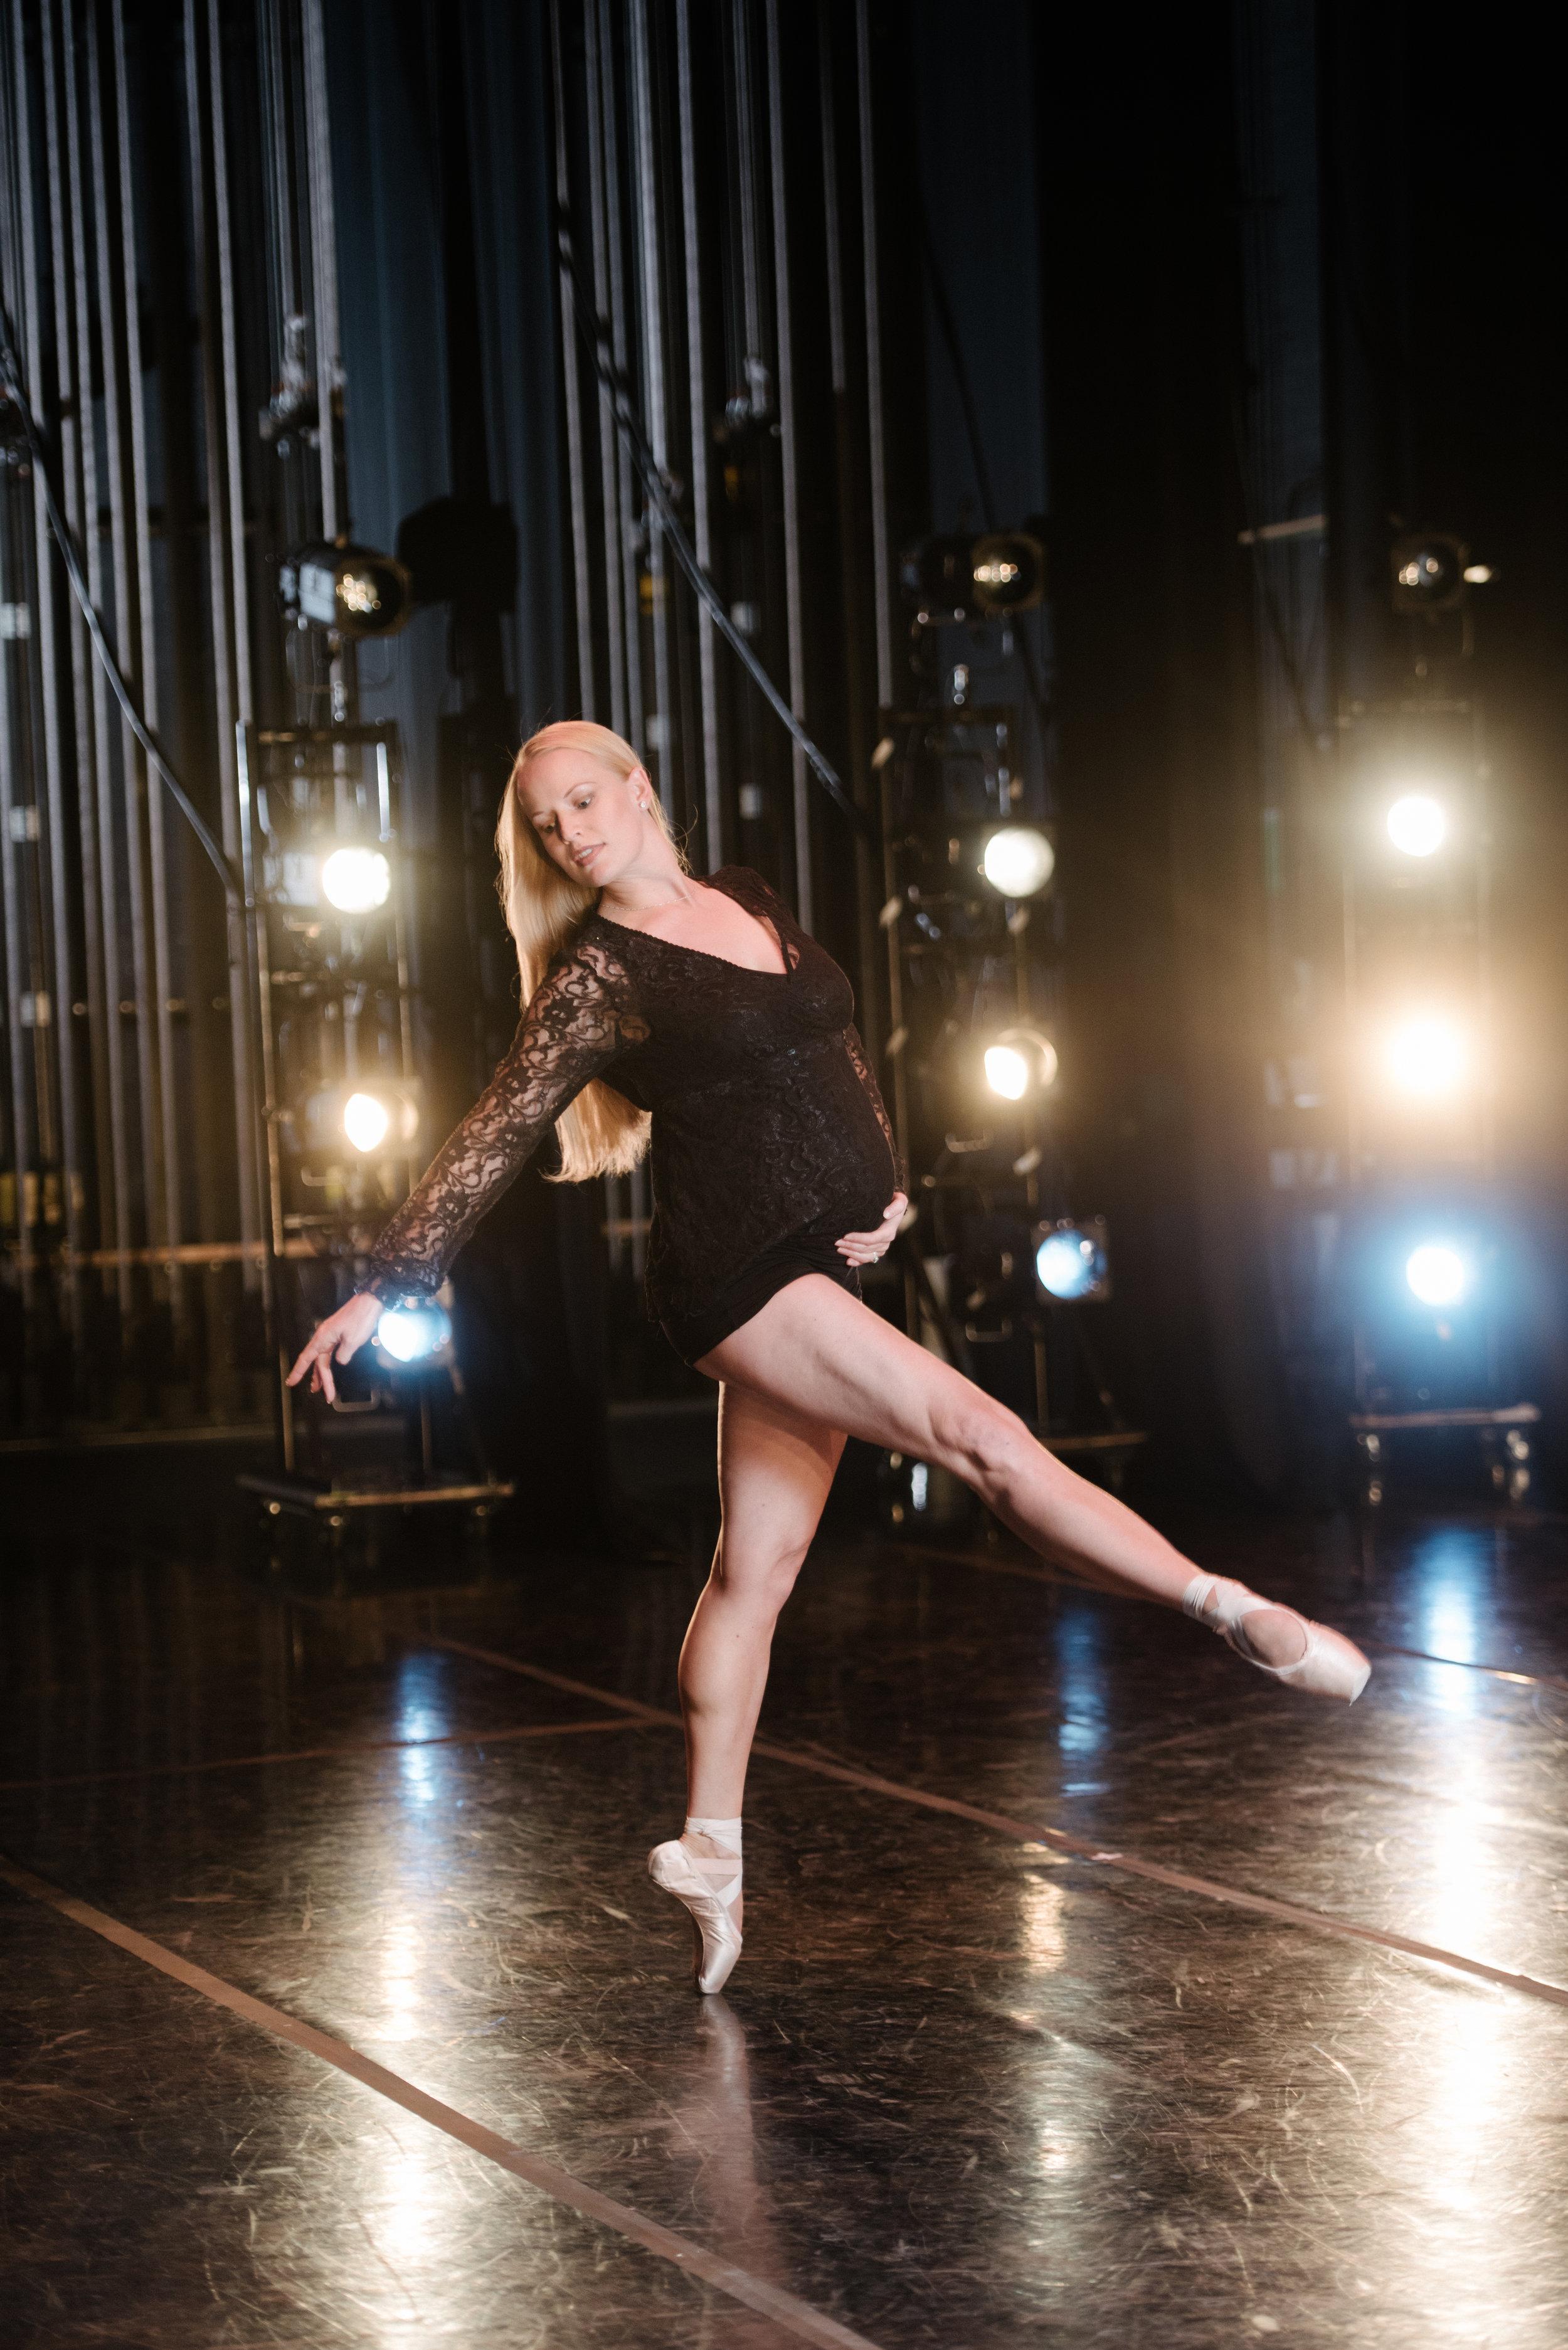 logan-utah-maternity-photography-ballerina